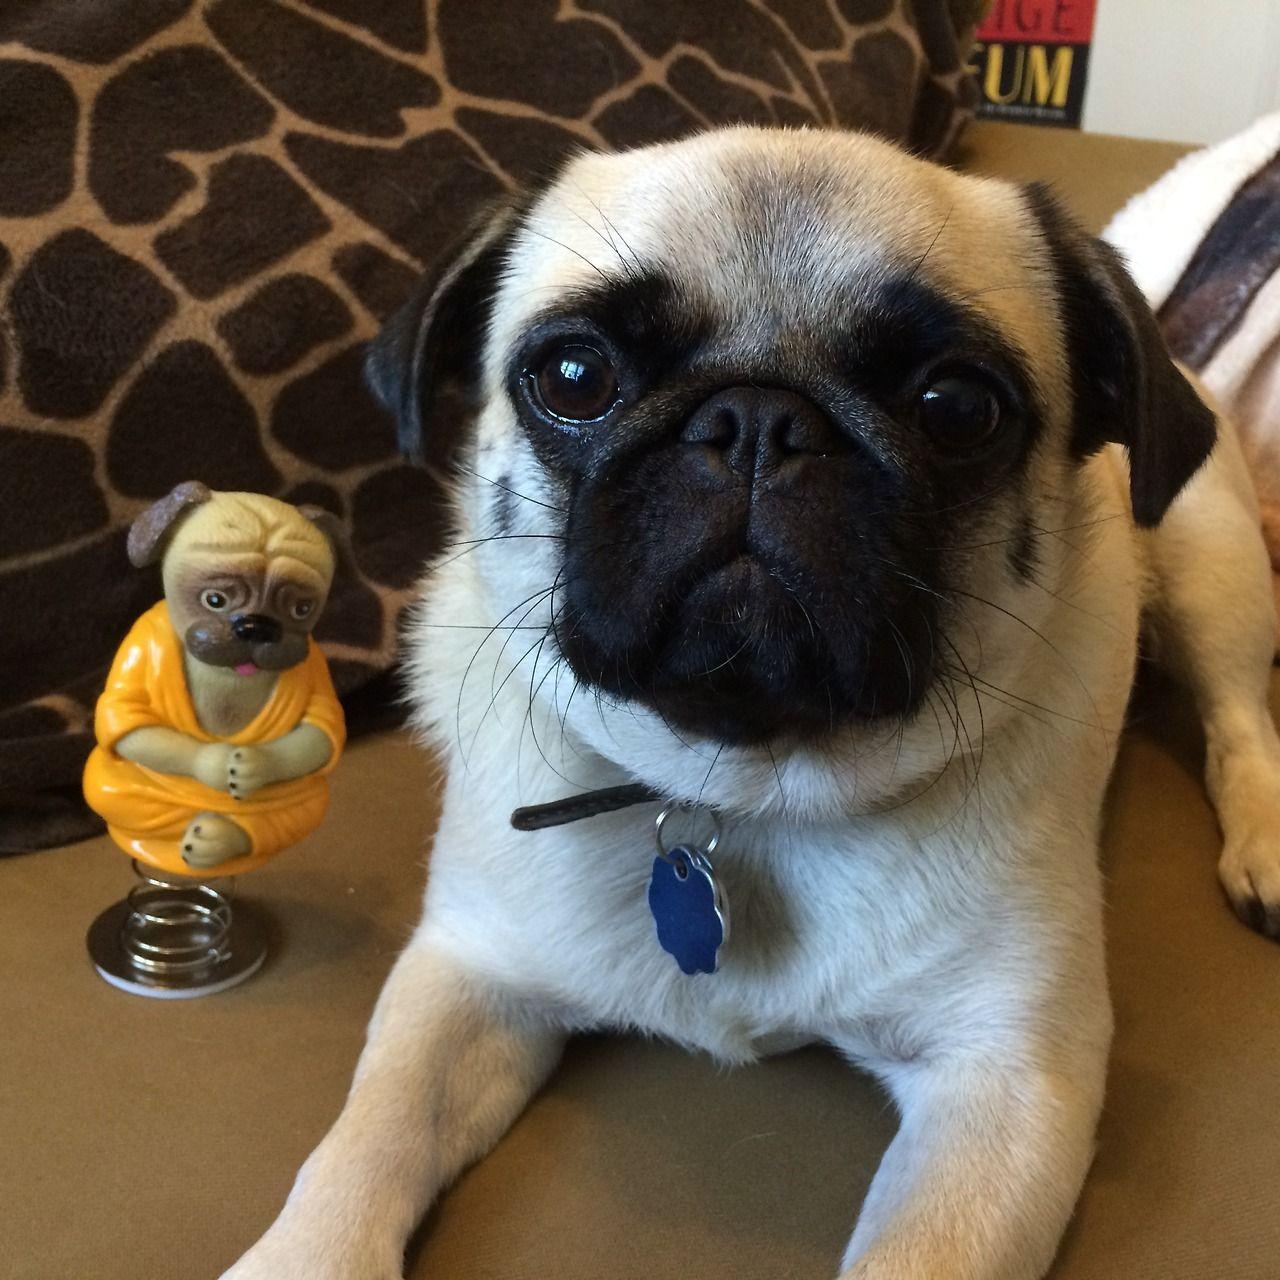 Wombatarama Momo S New Meditation Teacher Our New Dashboard Pug Buddha Already Has An Adorable Fan Pugs Pug